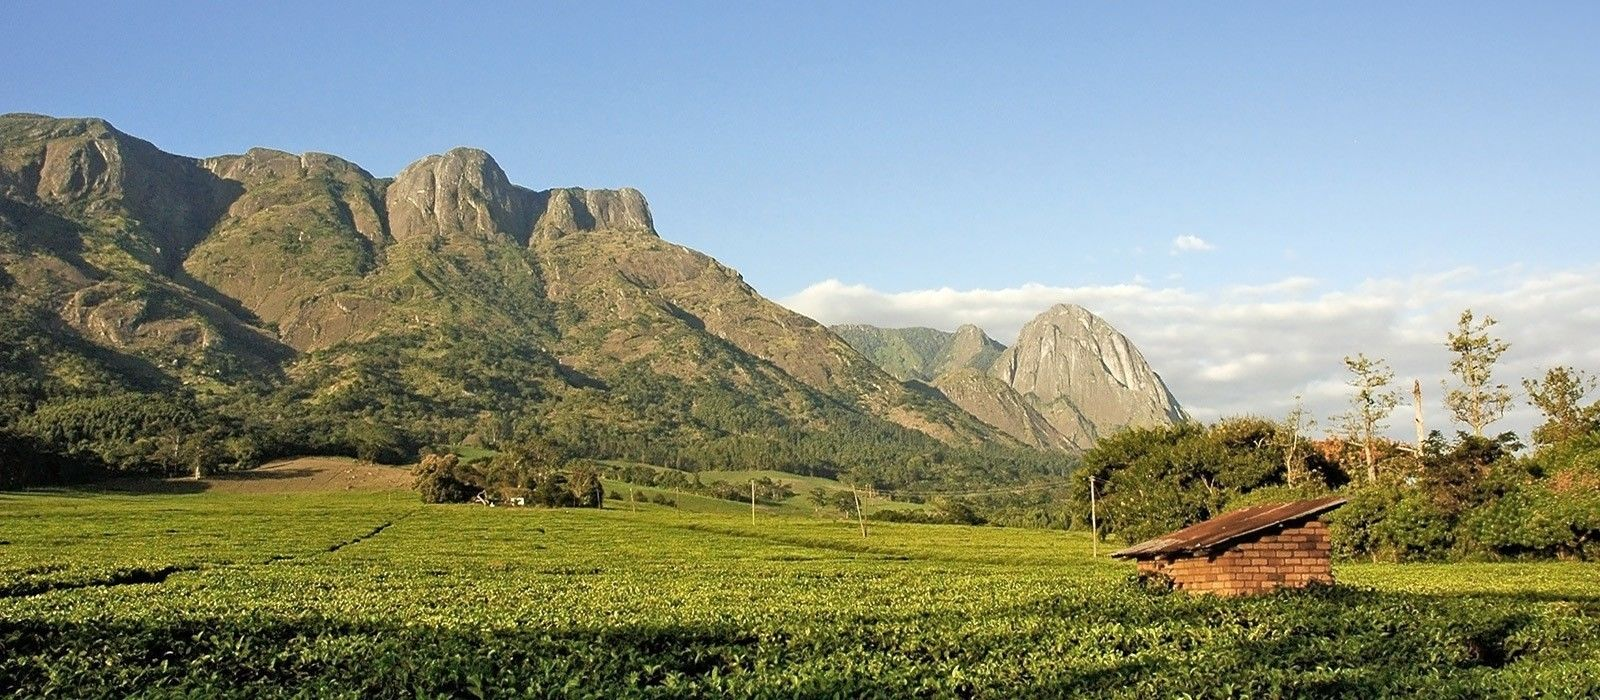 Destination Mulanje Malawi